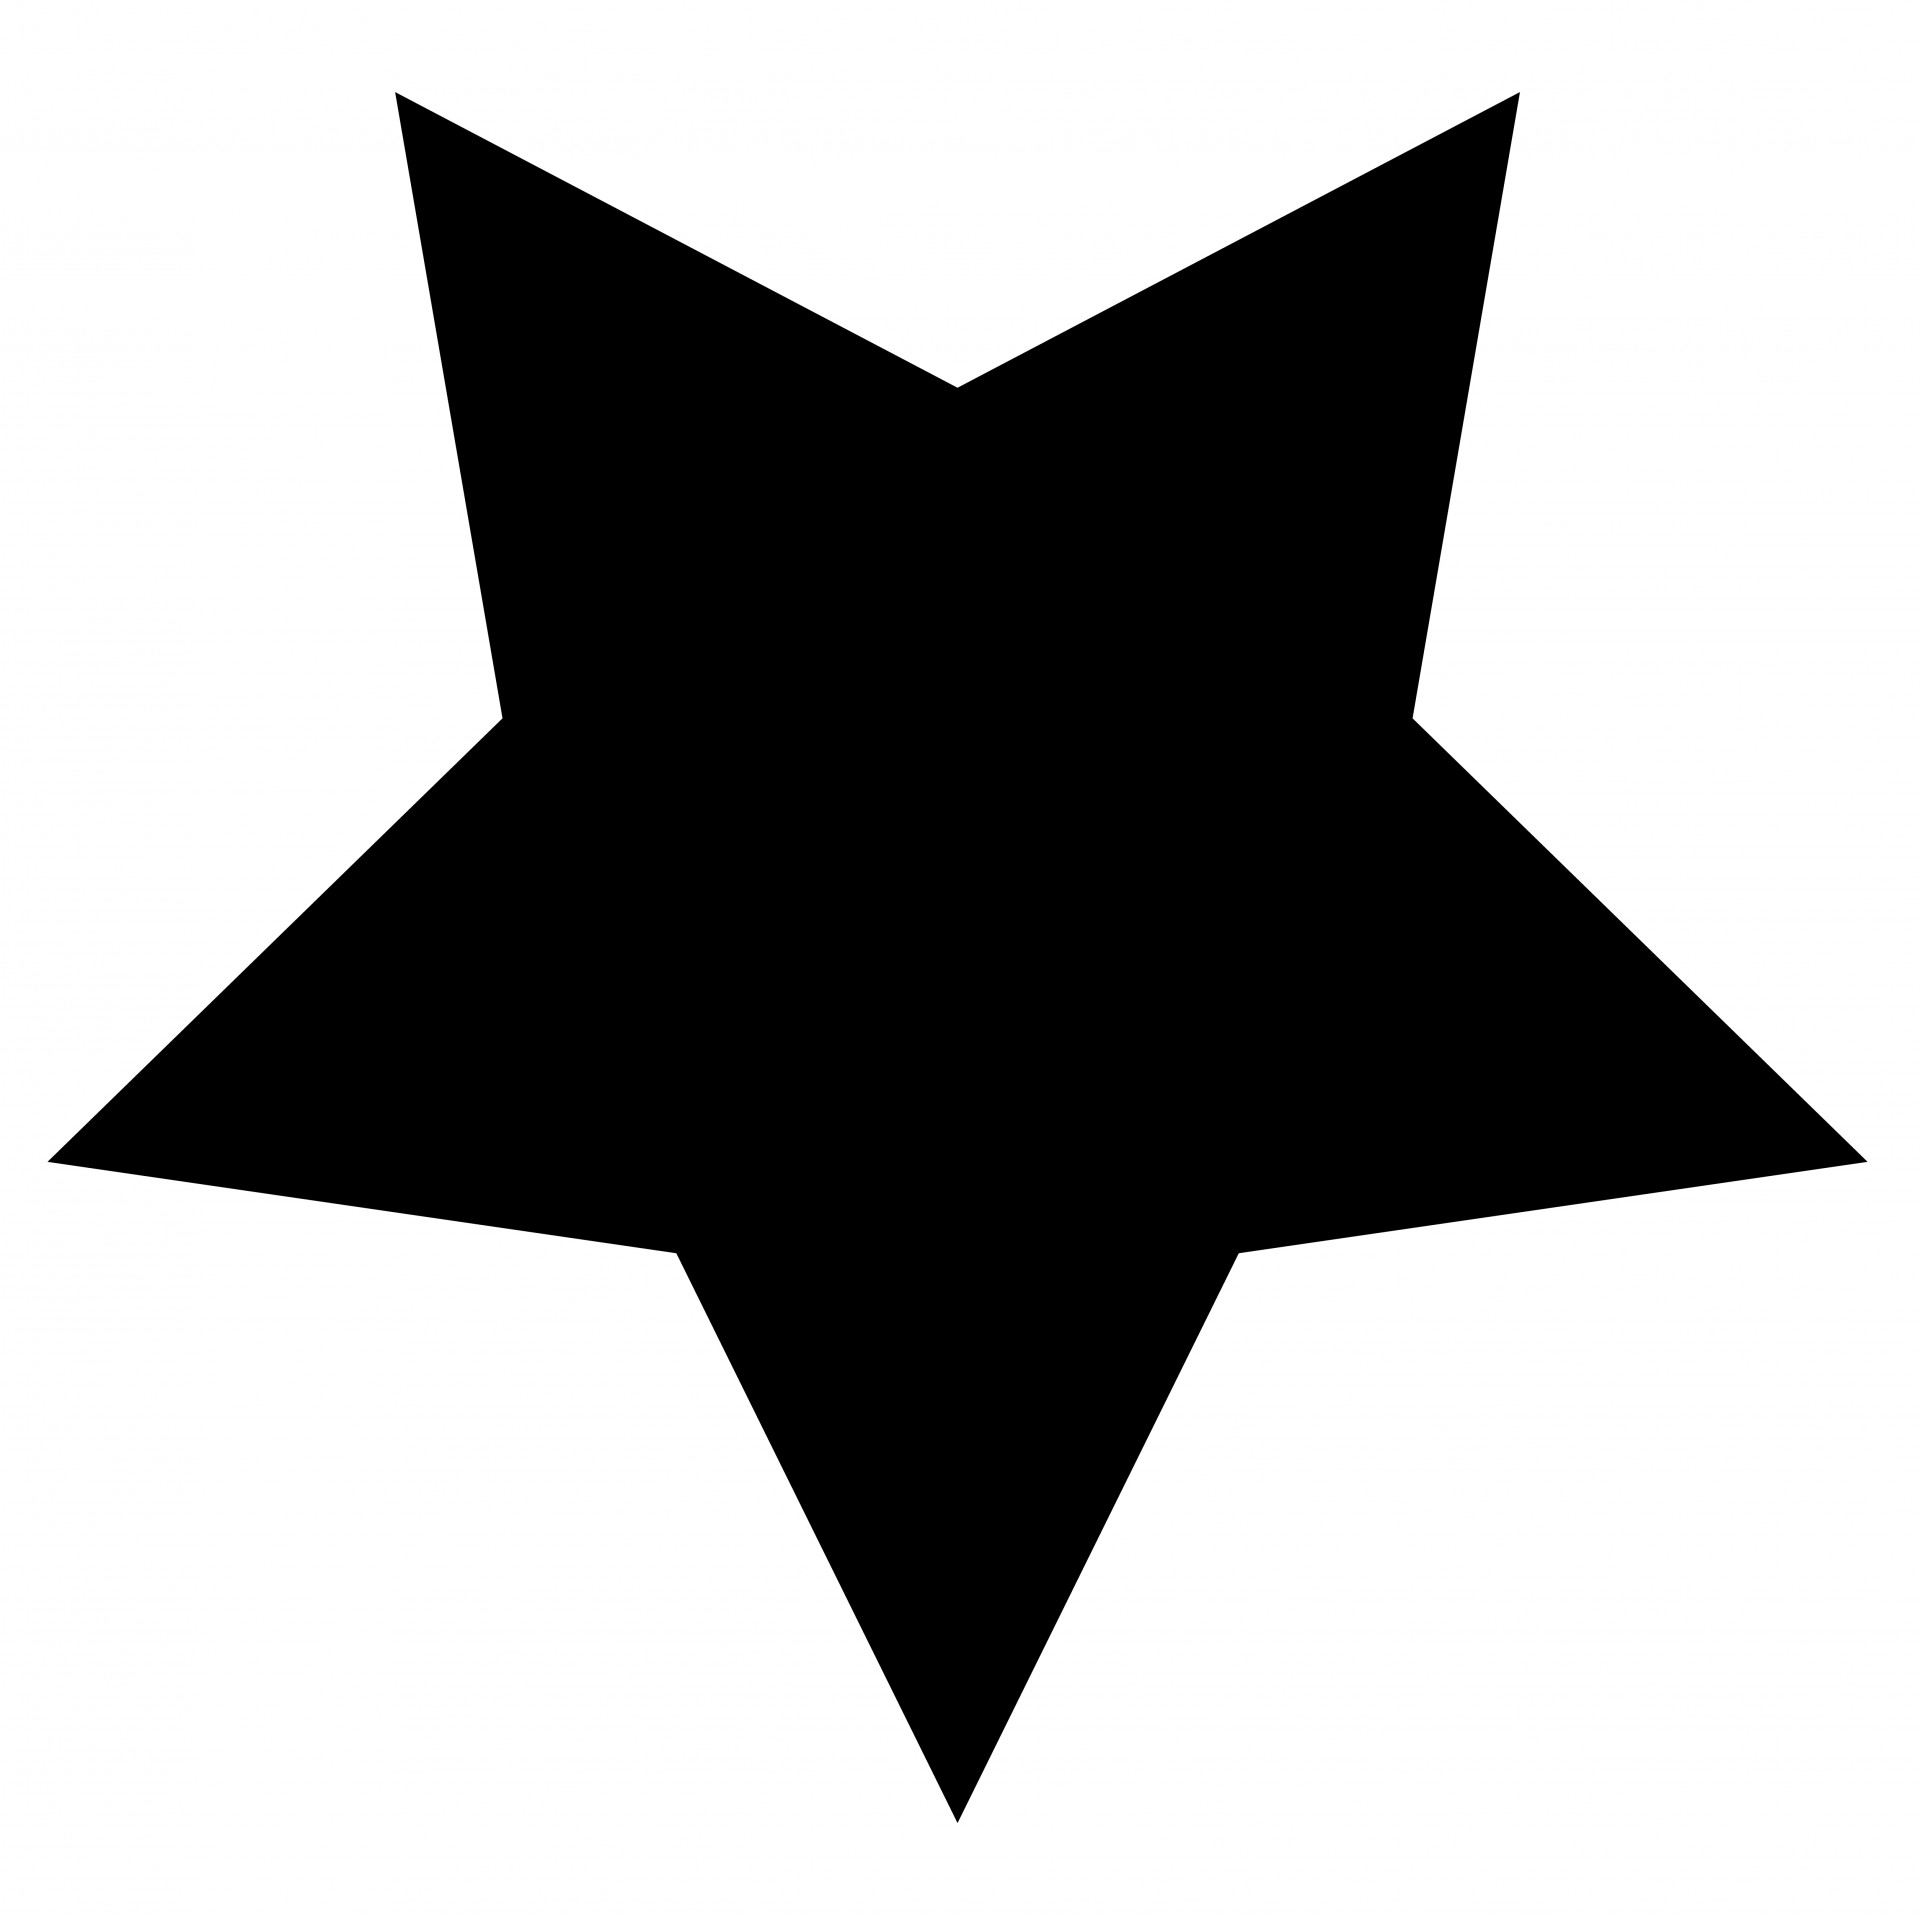 Black Star Clipart